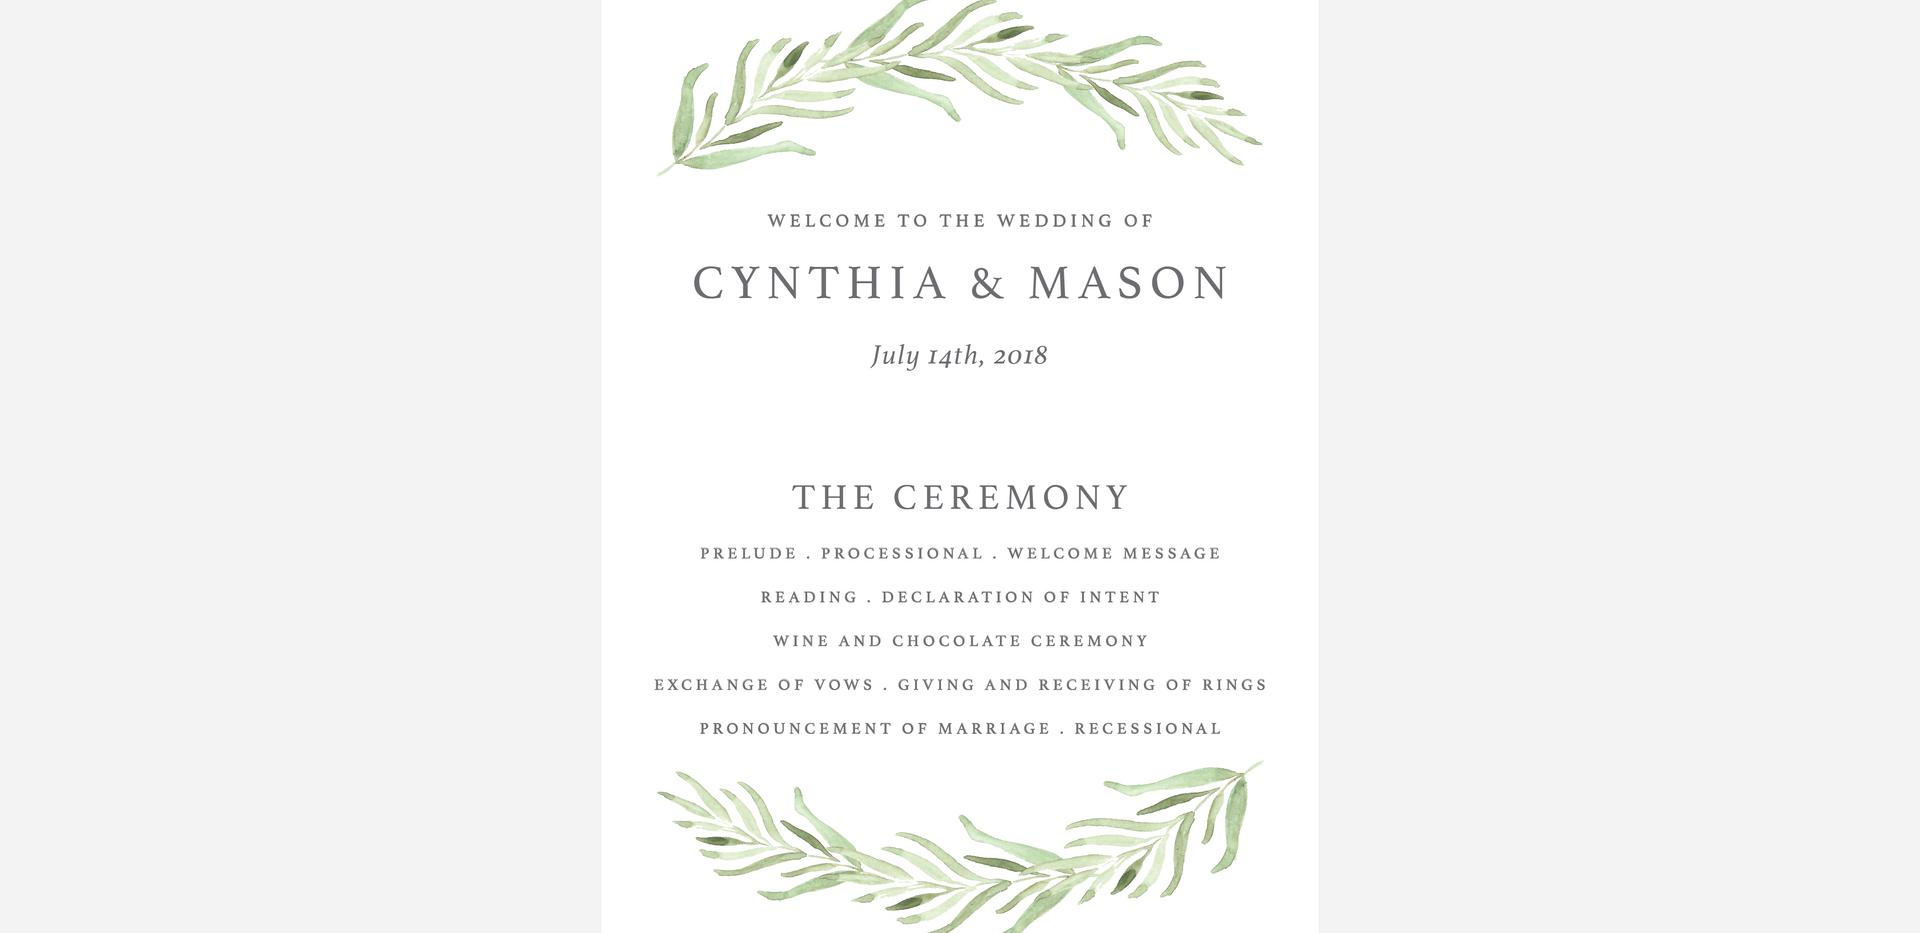 weddingprogram1.png